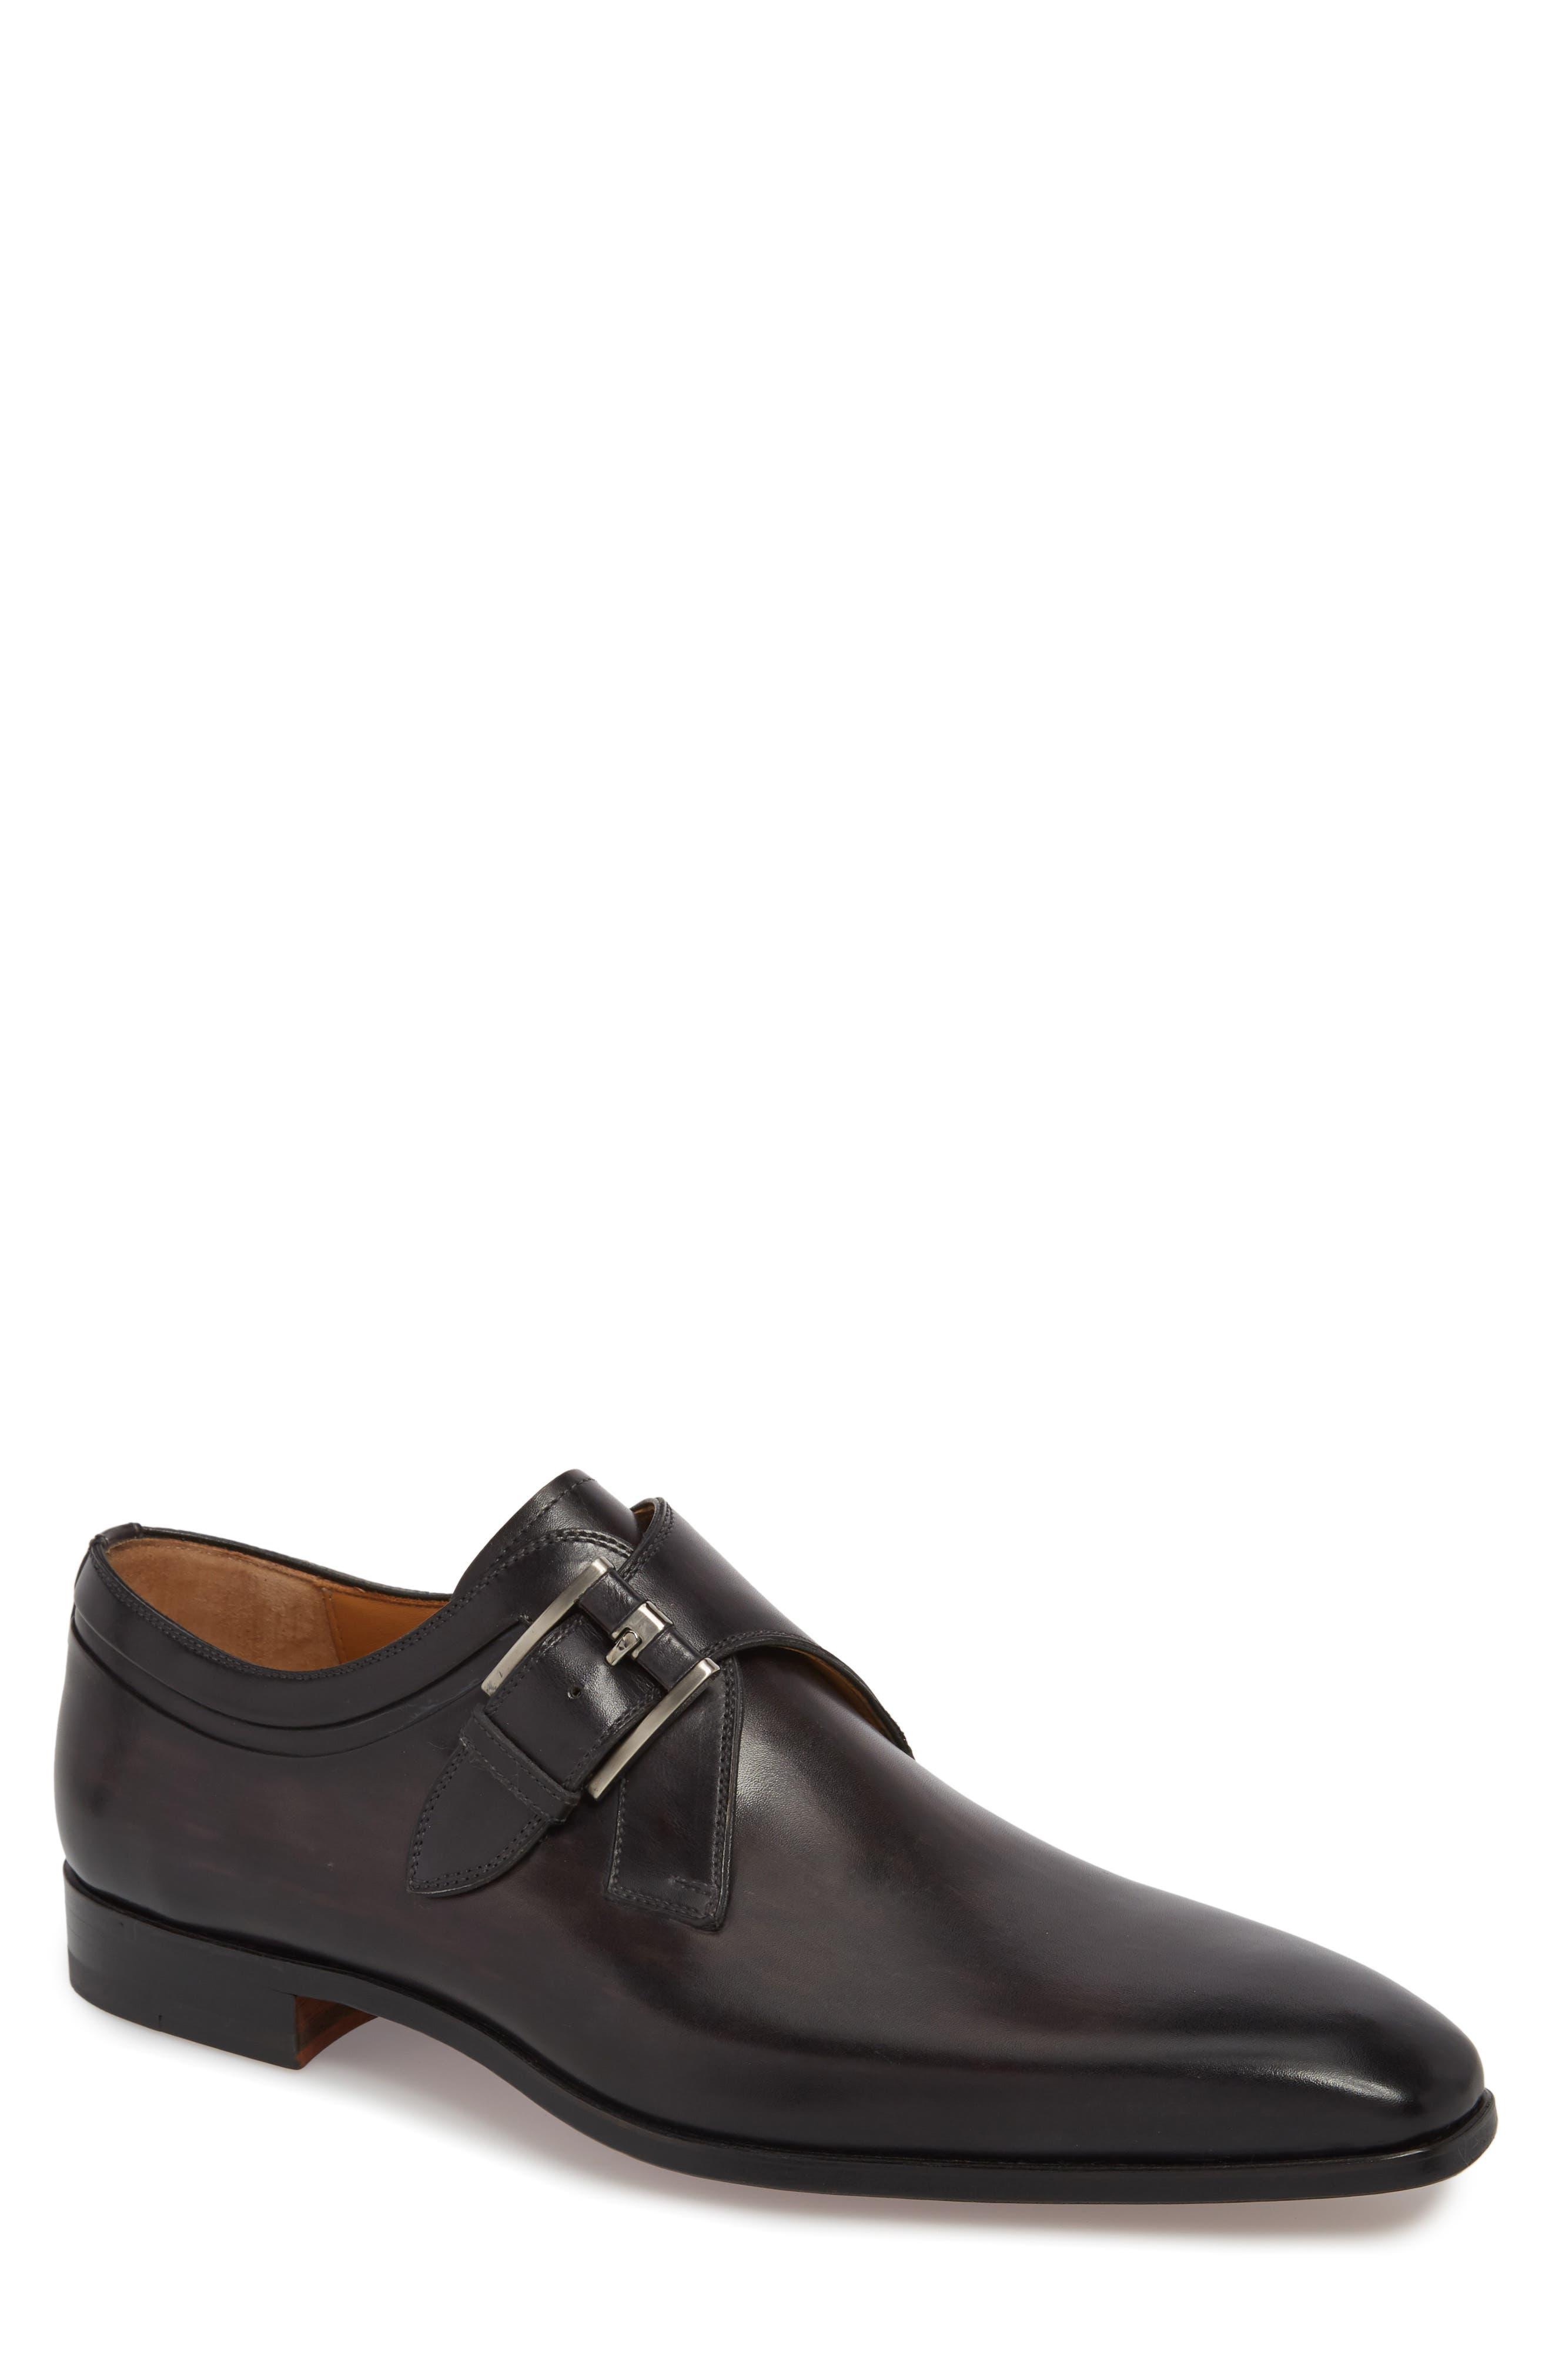 Toma Single Buckle Monk Shoe,                             Main thumbnail 1, color,                             Grey Leather